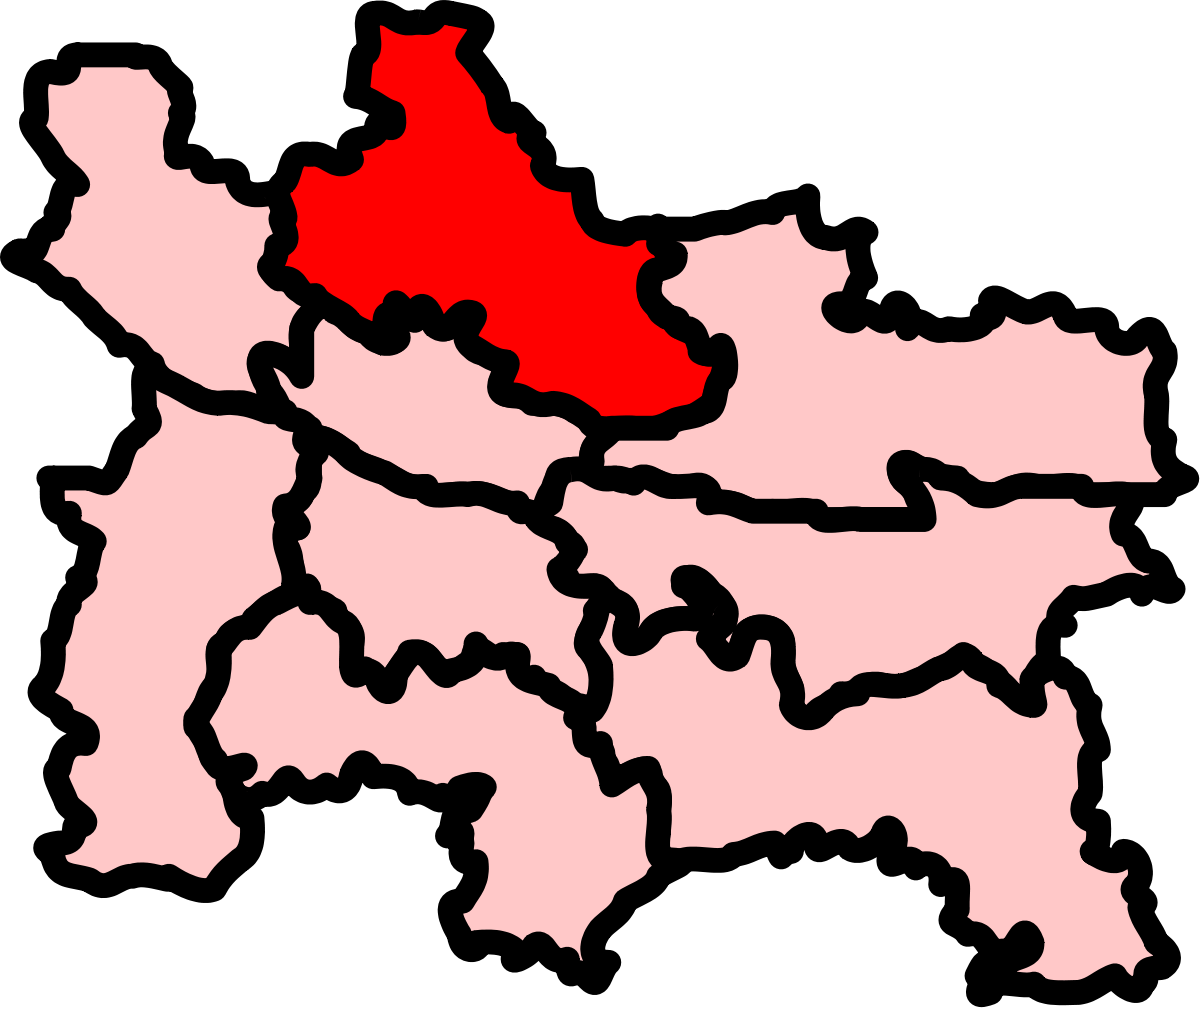 Glasgow Maryhill and Springburn (Scottish Parliament constituency.